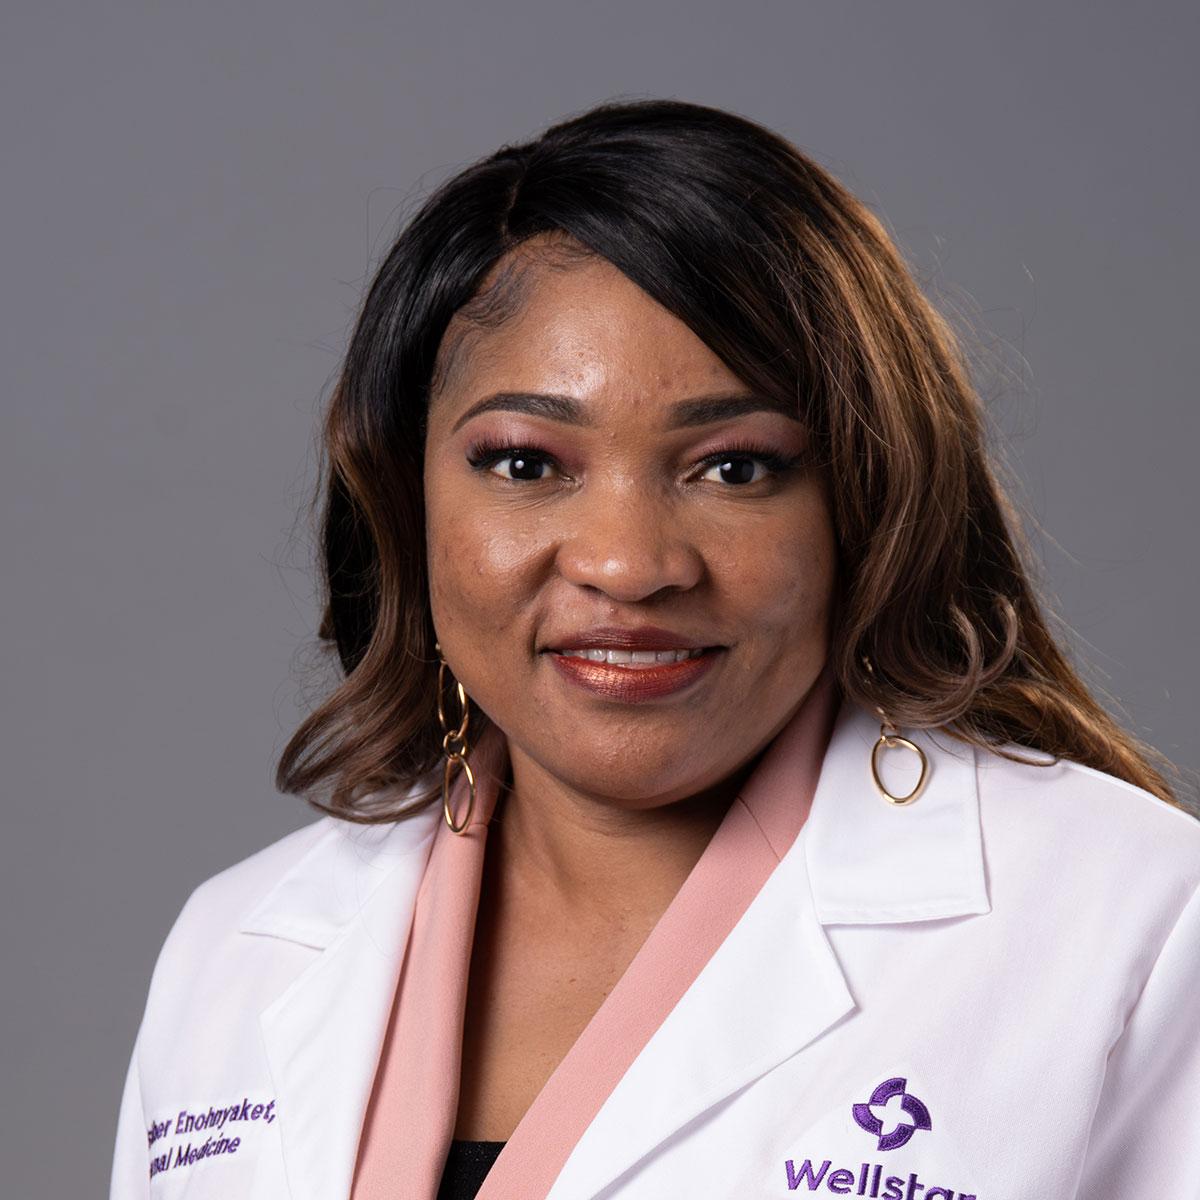 A friendly headshot of Dr. Esther Enohnyaket